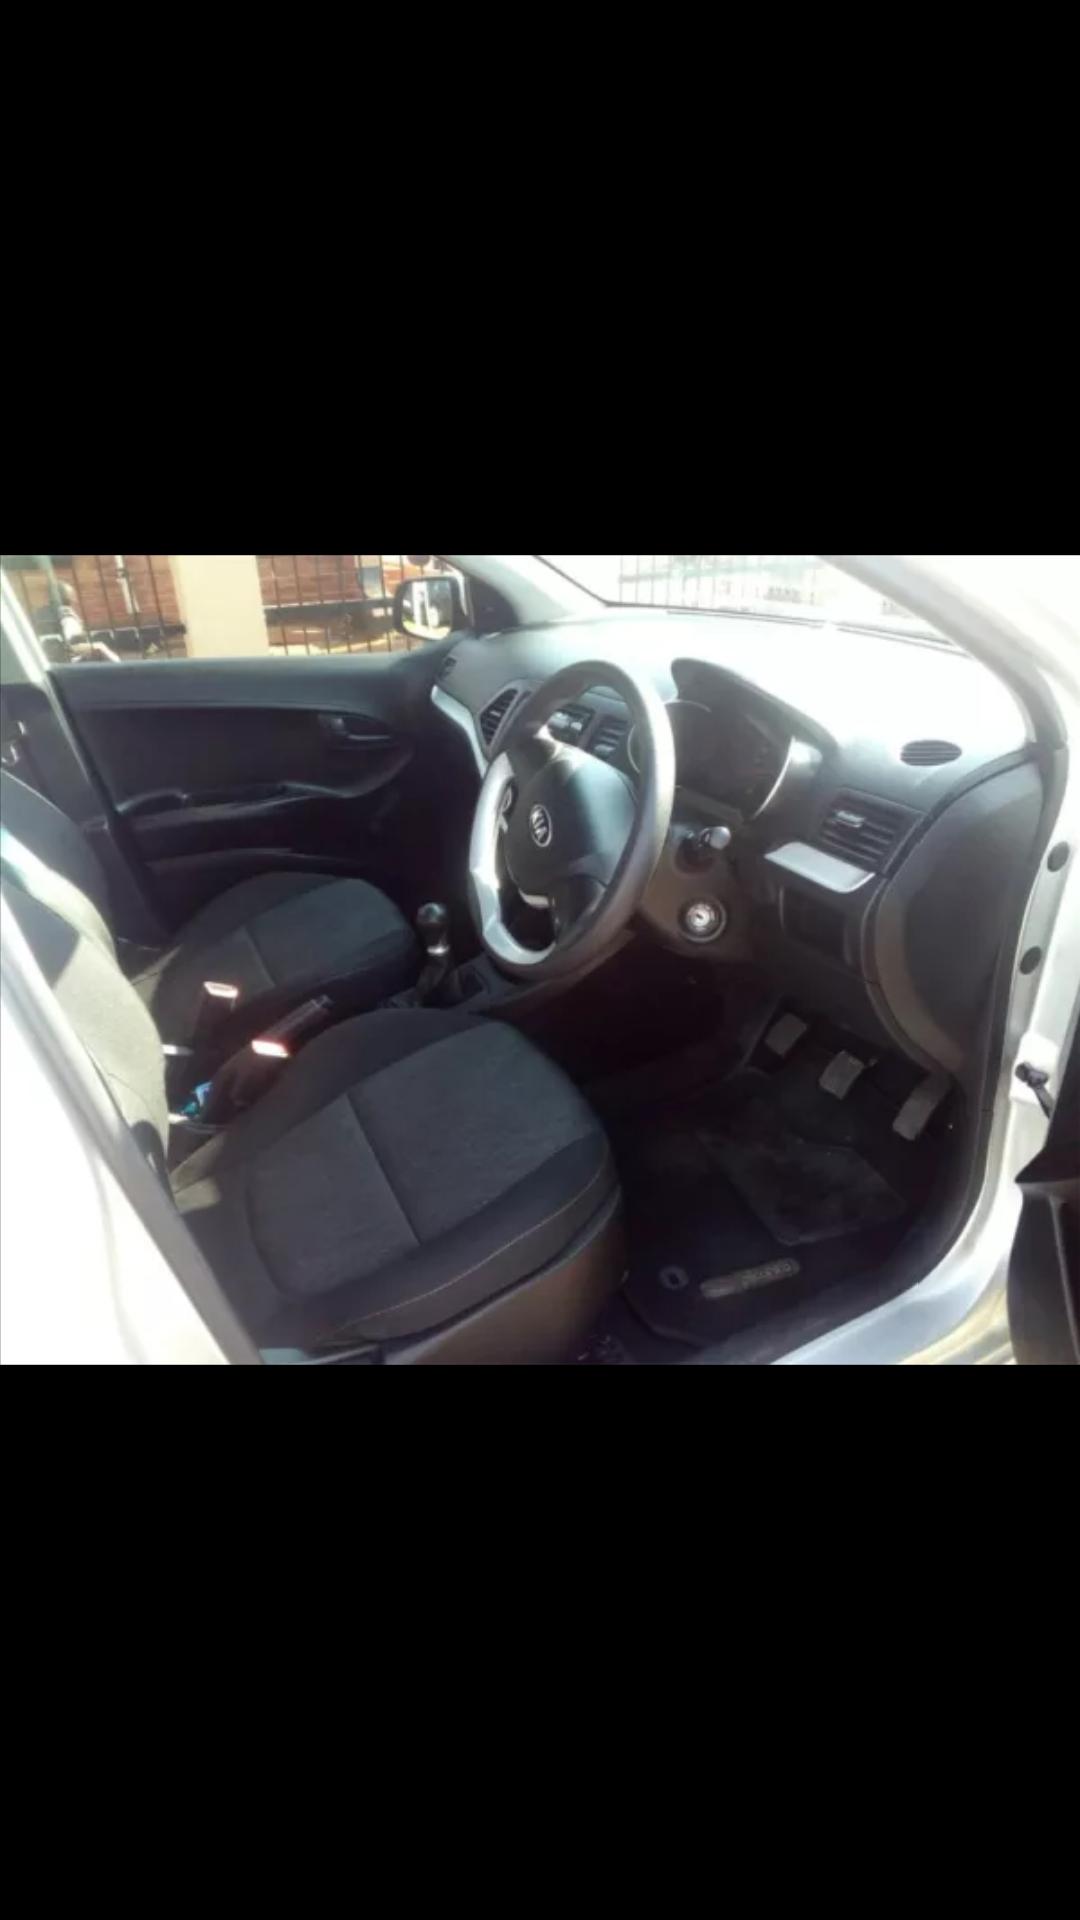 2012 Kia Picanto 1.0